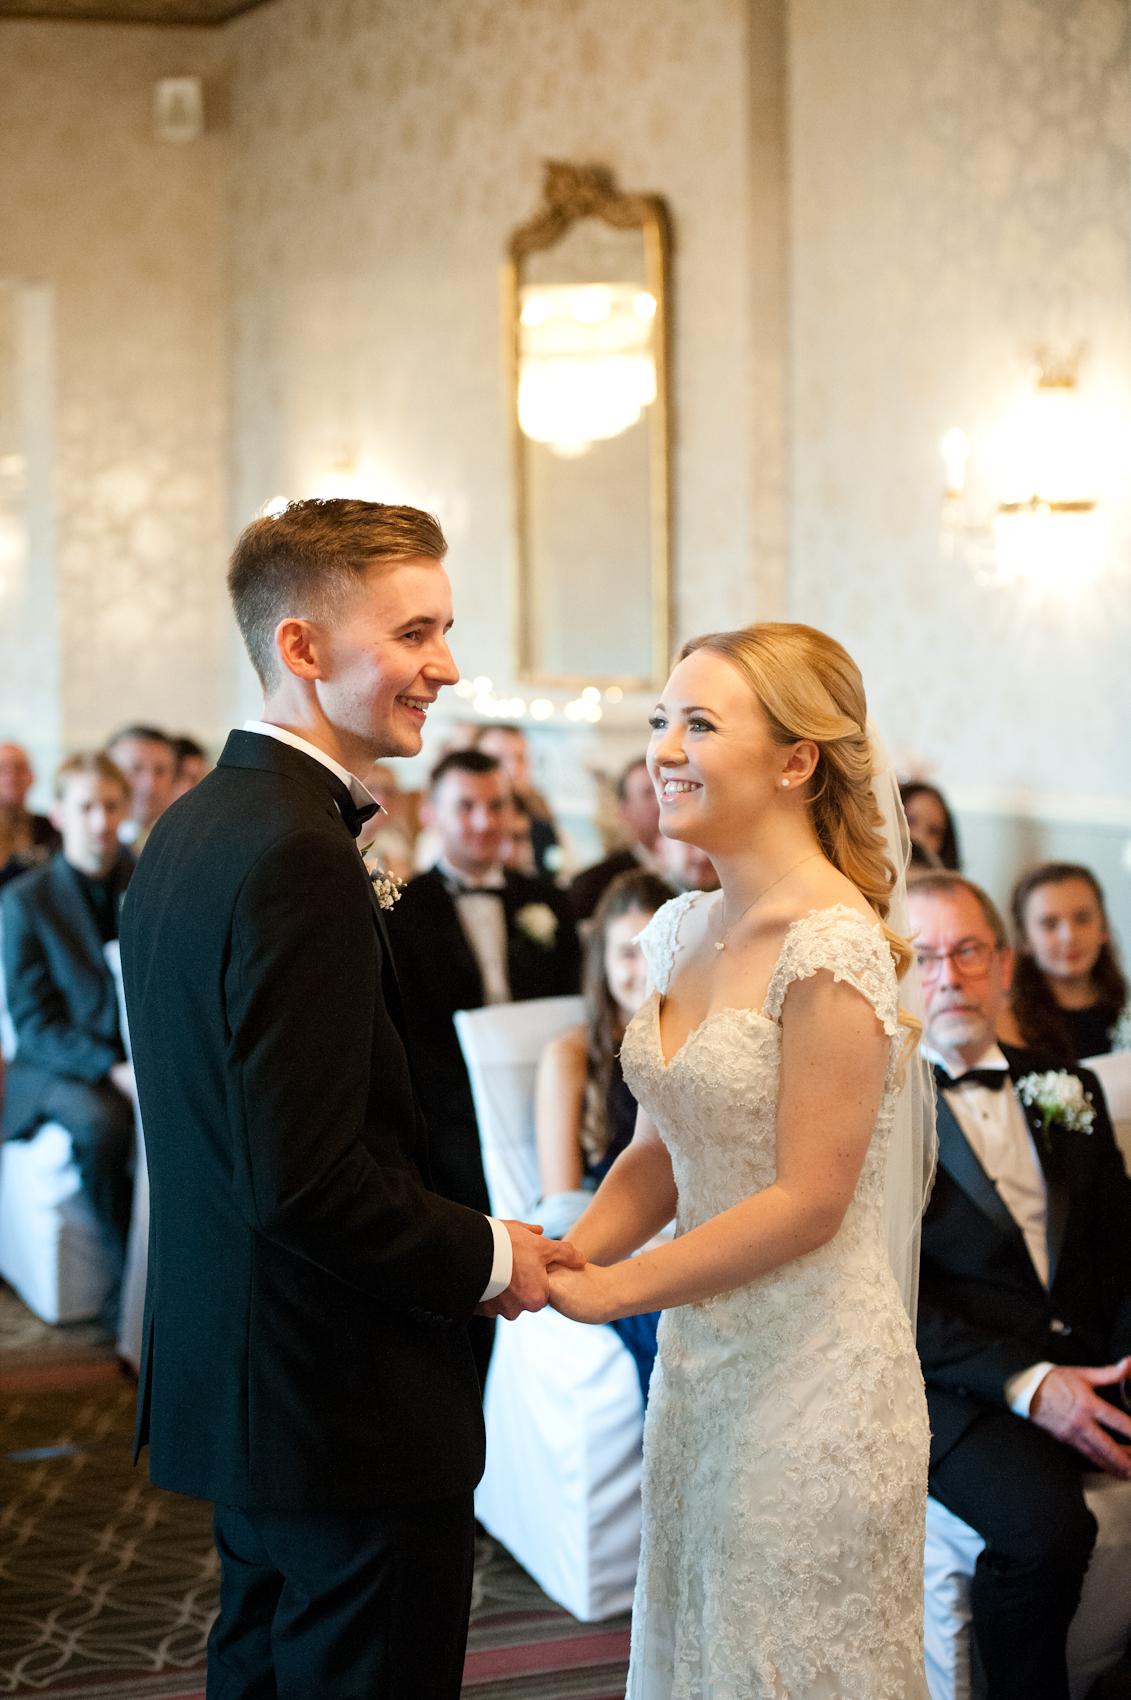 Declan & Emma wedding (9 of 29).jpg